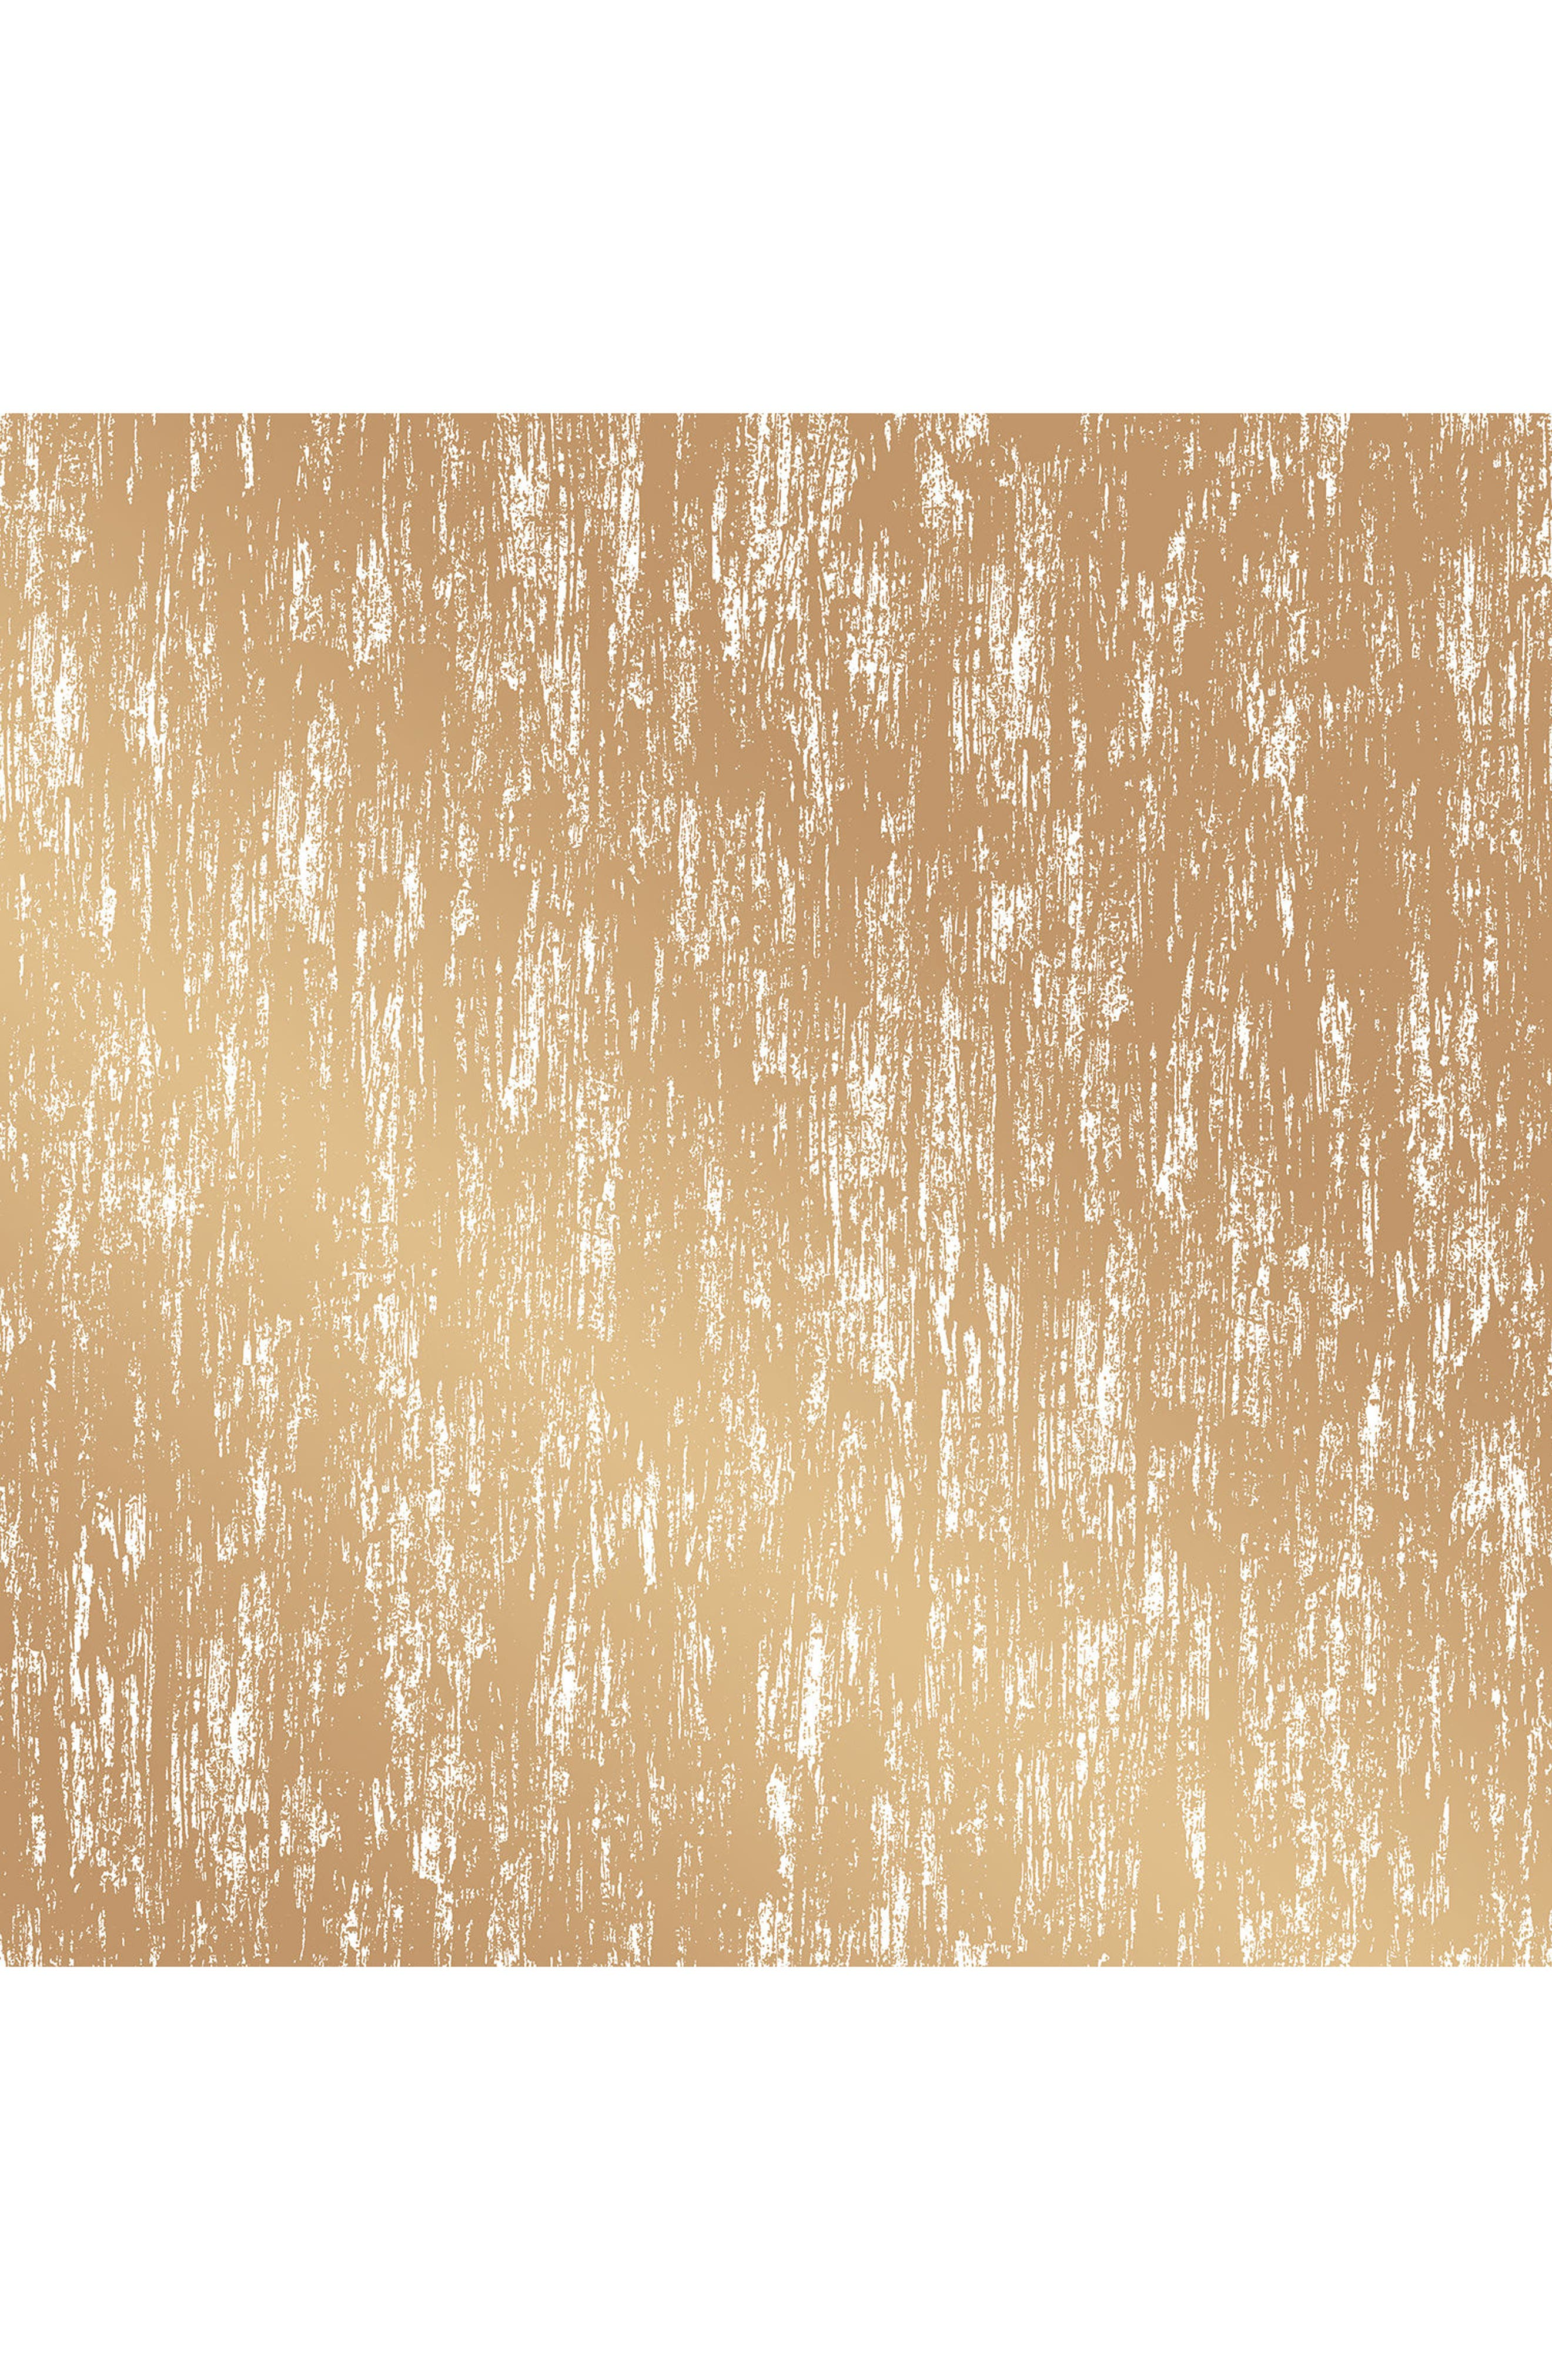 Gold Leaf Self Adhesive Vinyl Wallpaper,                             Main thumbnail 1, color,